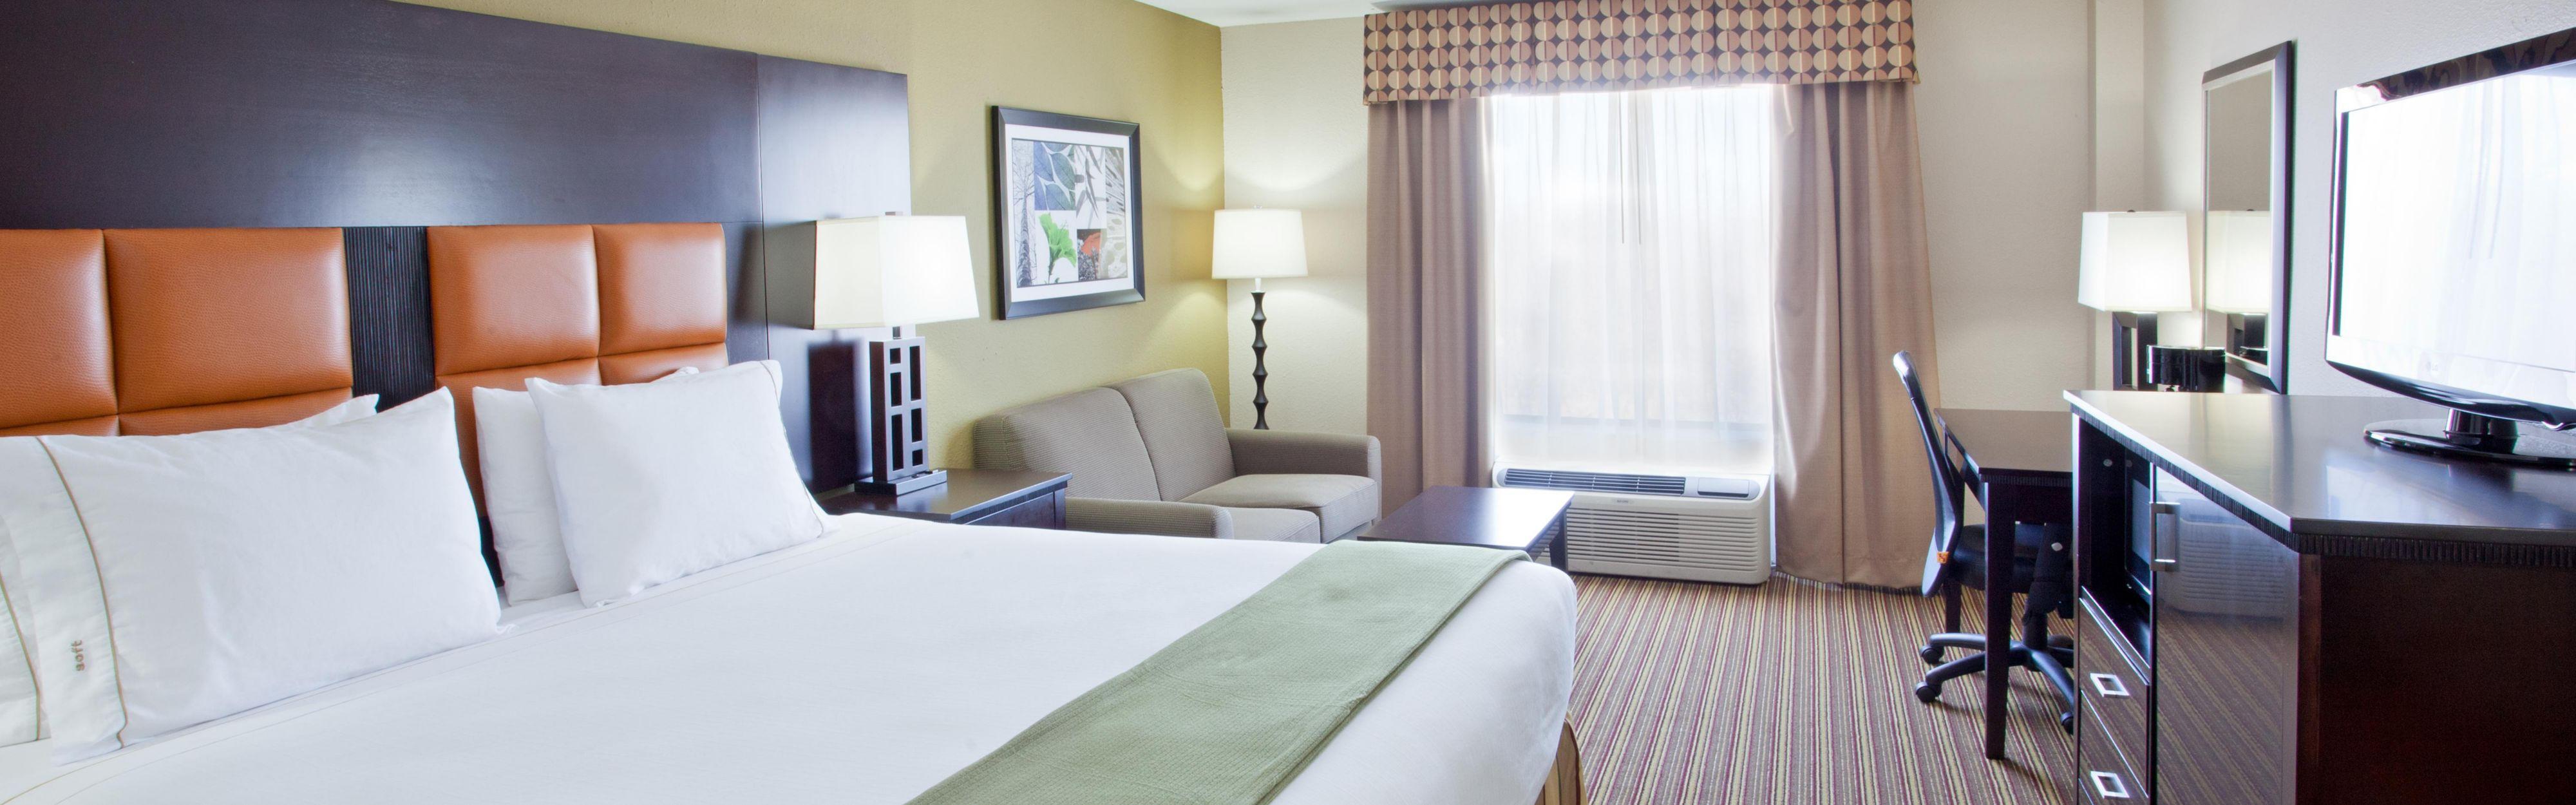 Holiday Inn Express & Suites Arlington (I-20-Parks Mall) image 1